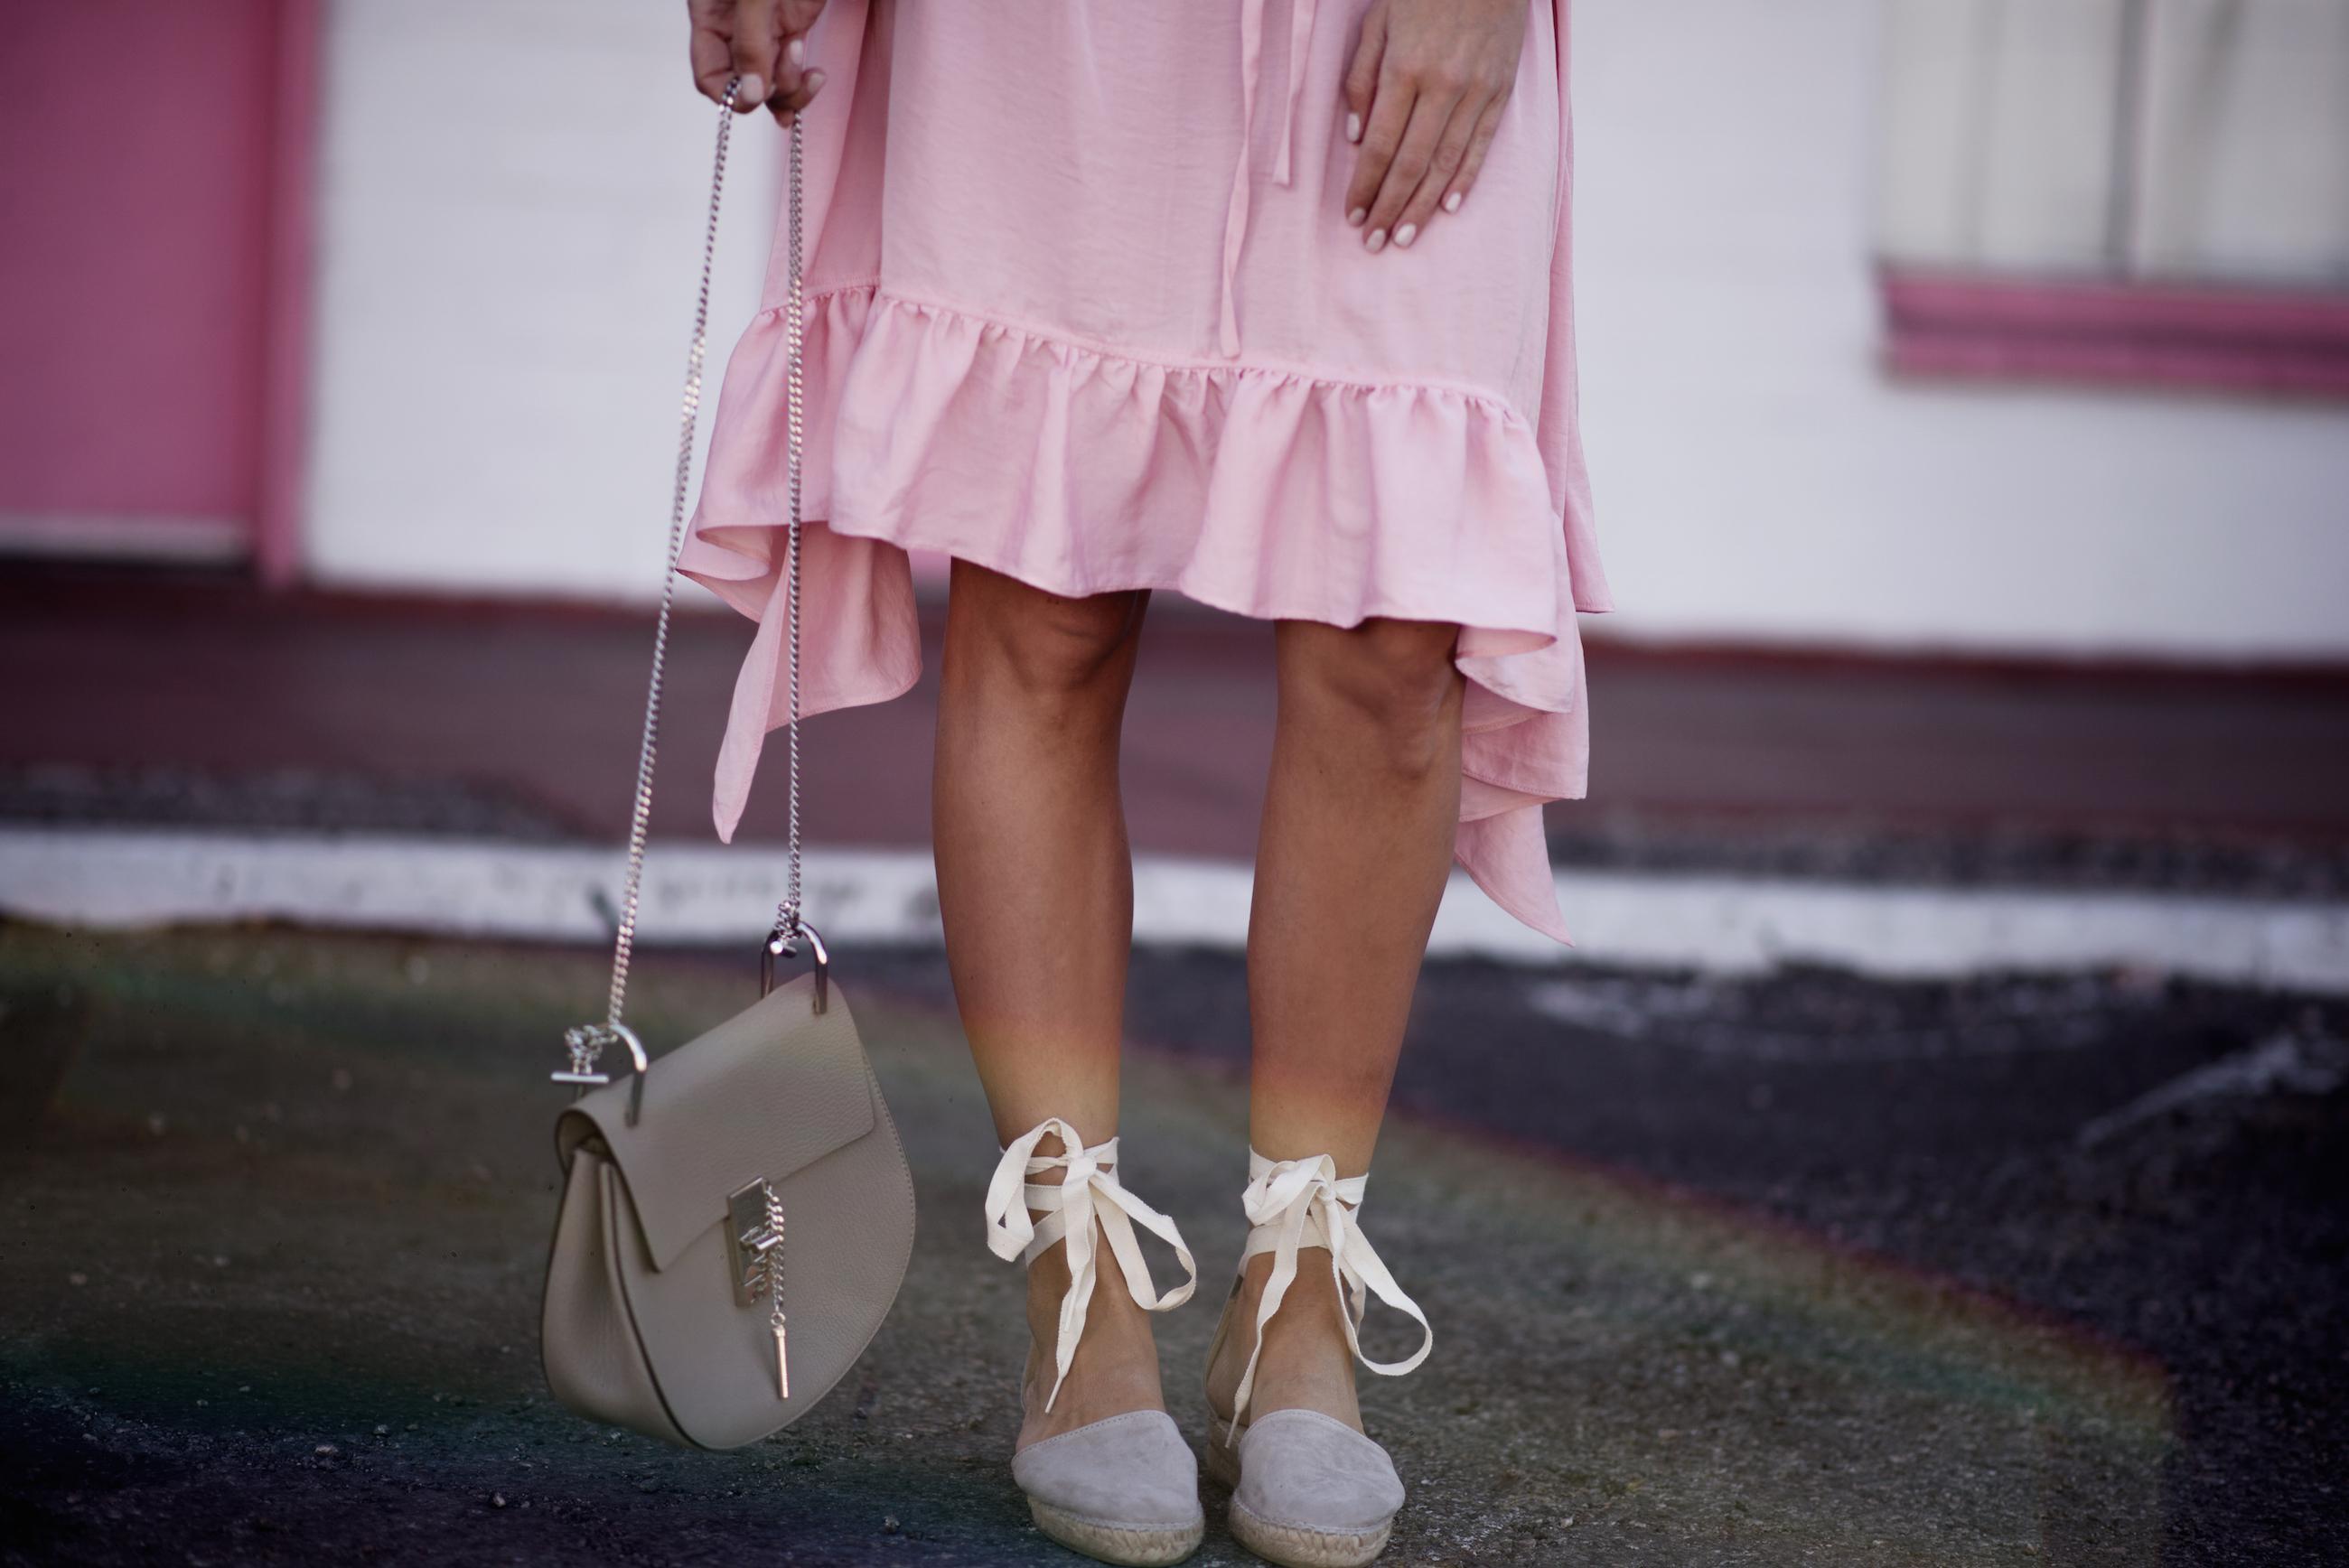 Outfit-PinkDress-FashionBlogger-ChloeDrew-SequinSophia-7-LIN_7207